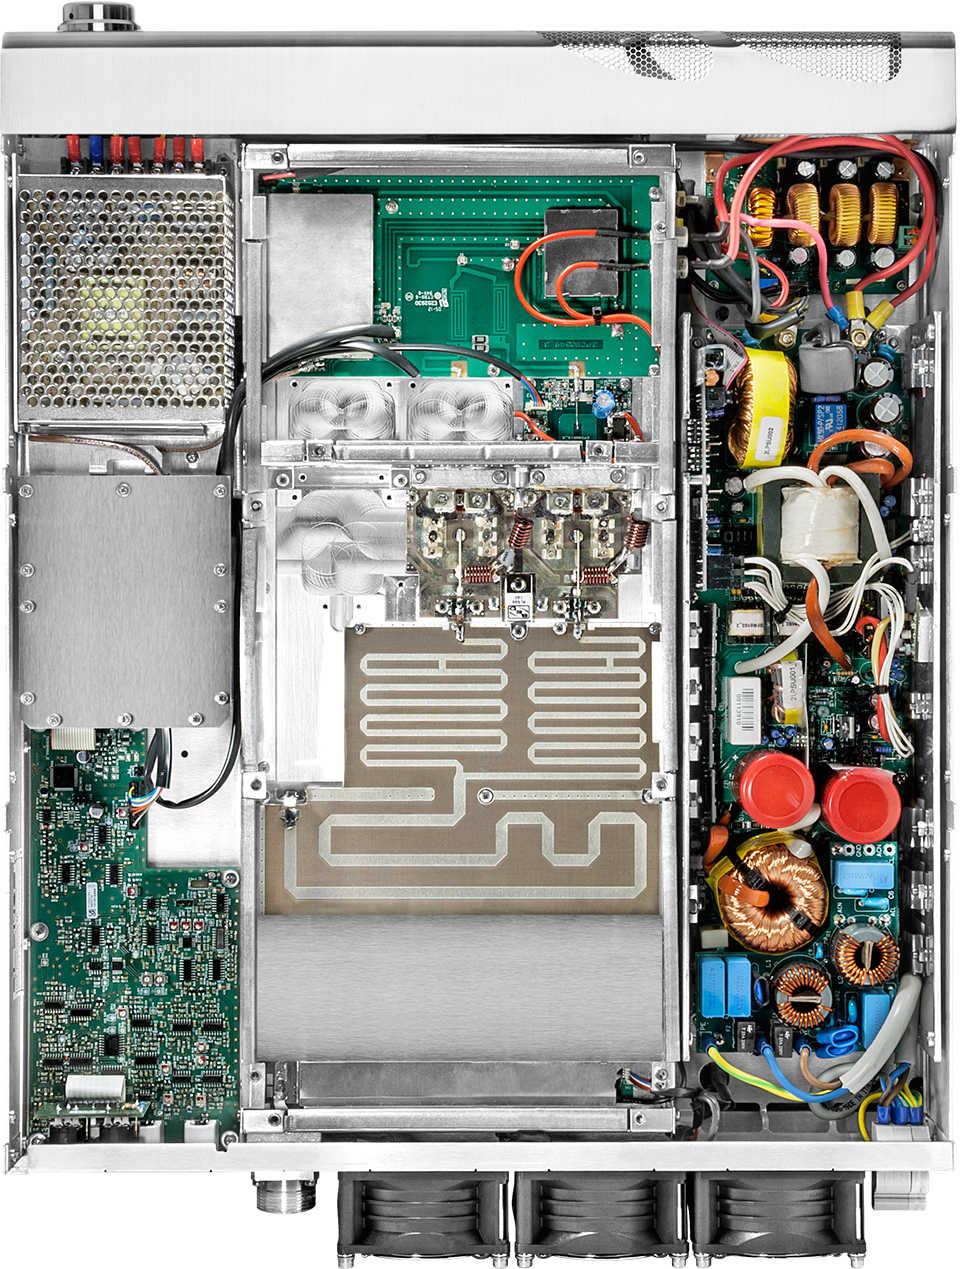 Low Power 150w 2000w Etg Indium Fm Transmitters Elenos World Range Transmitter Circuit Diagram As Well Highlights